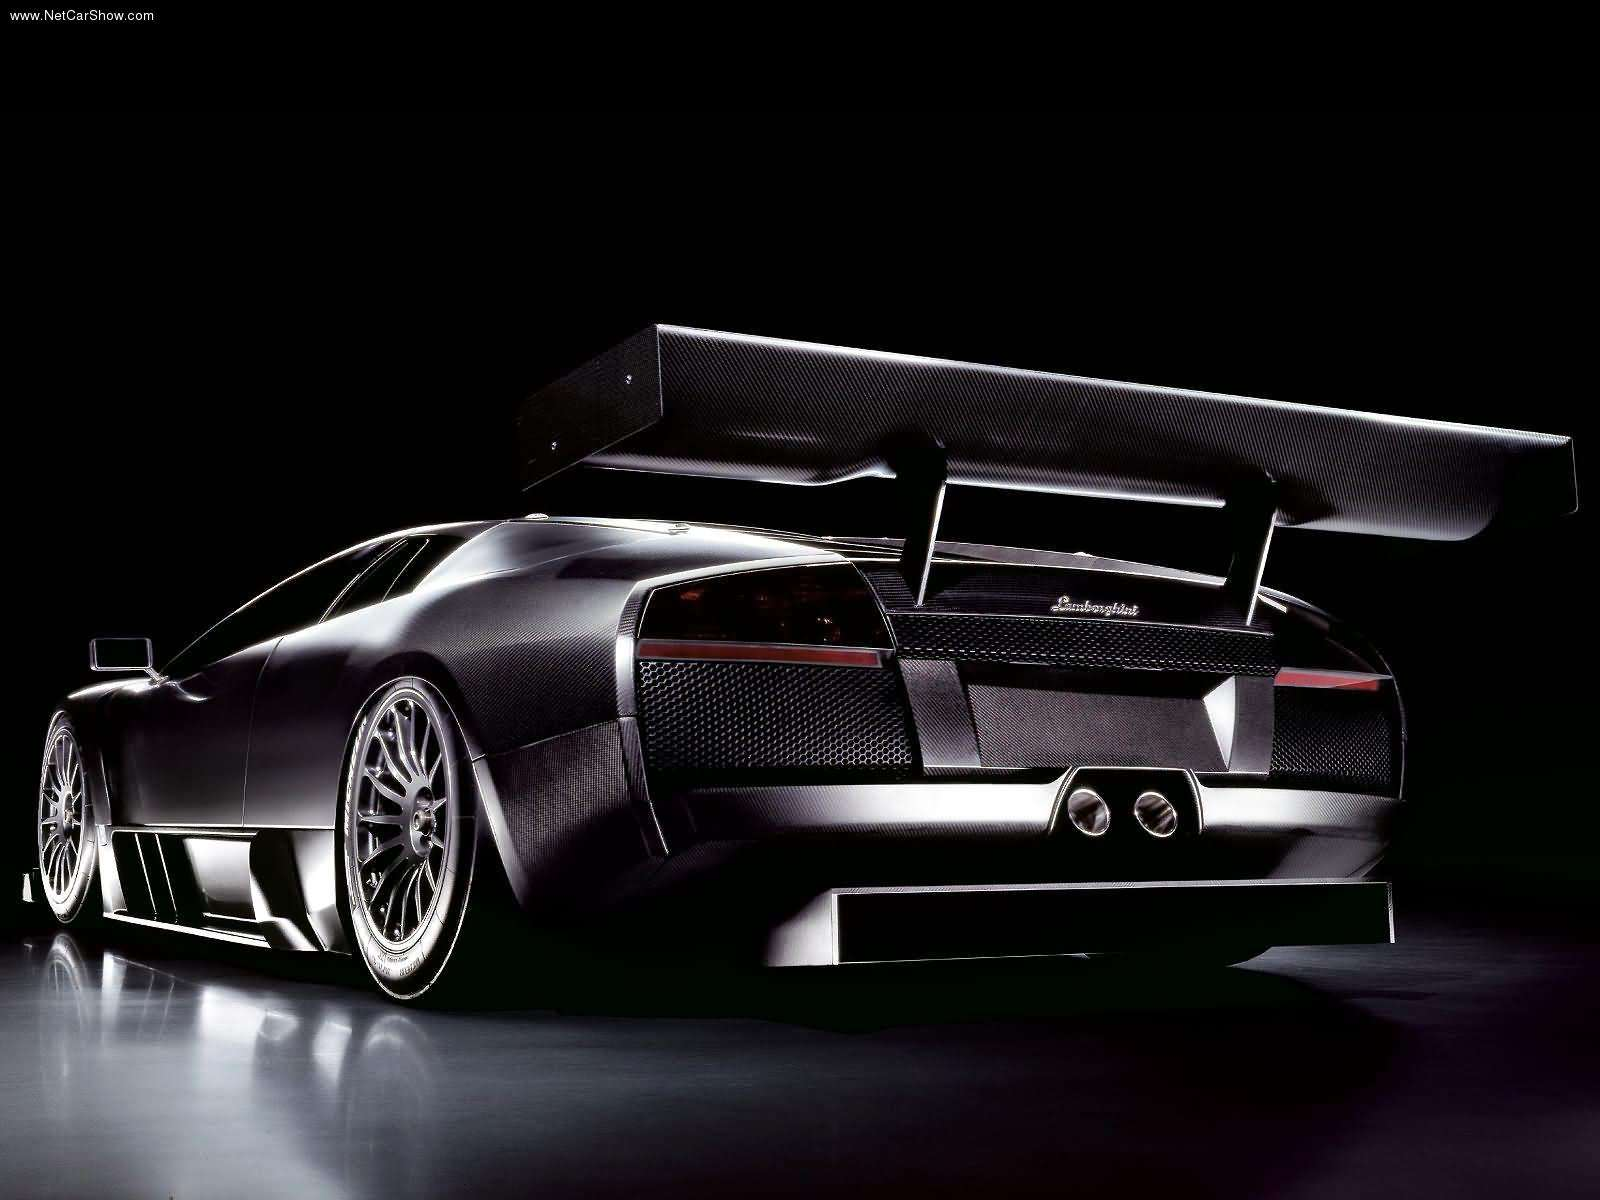 Hình ảnh siêu xe Lamborghini Murcielago RGT 2003 & nội ngoại thất